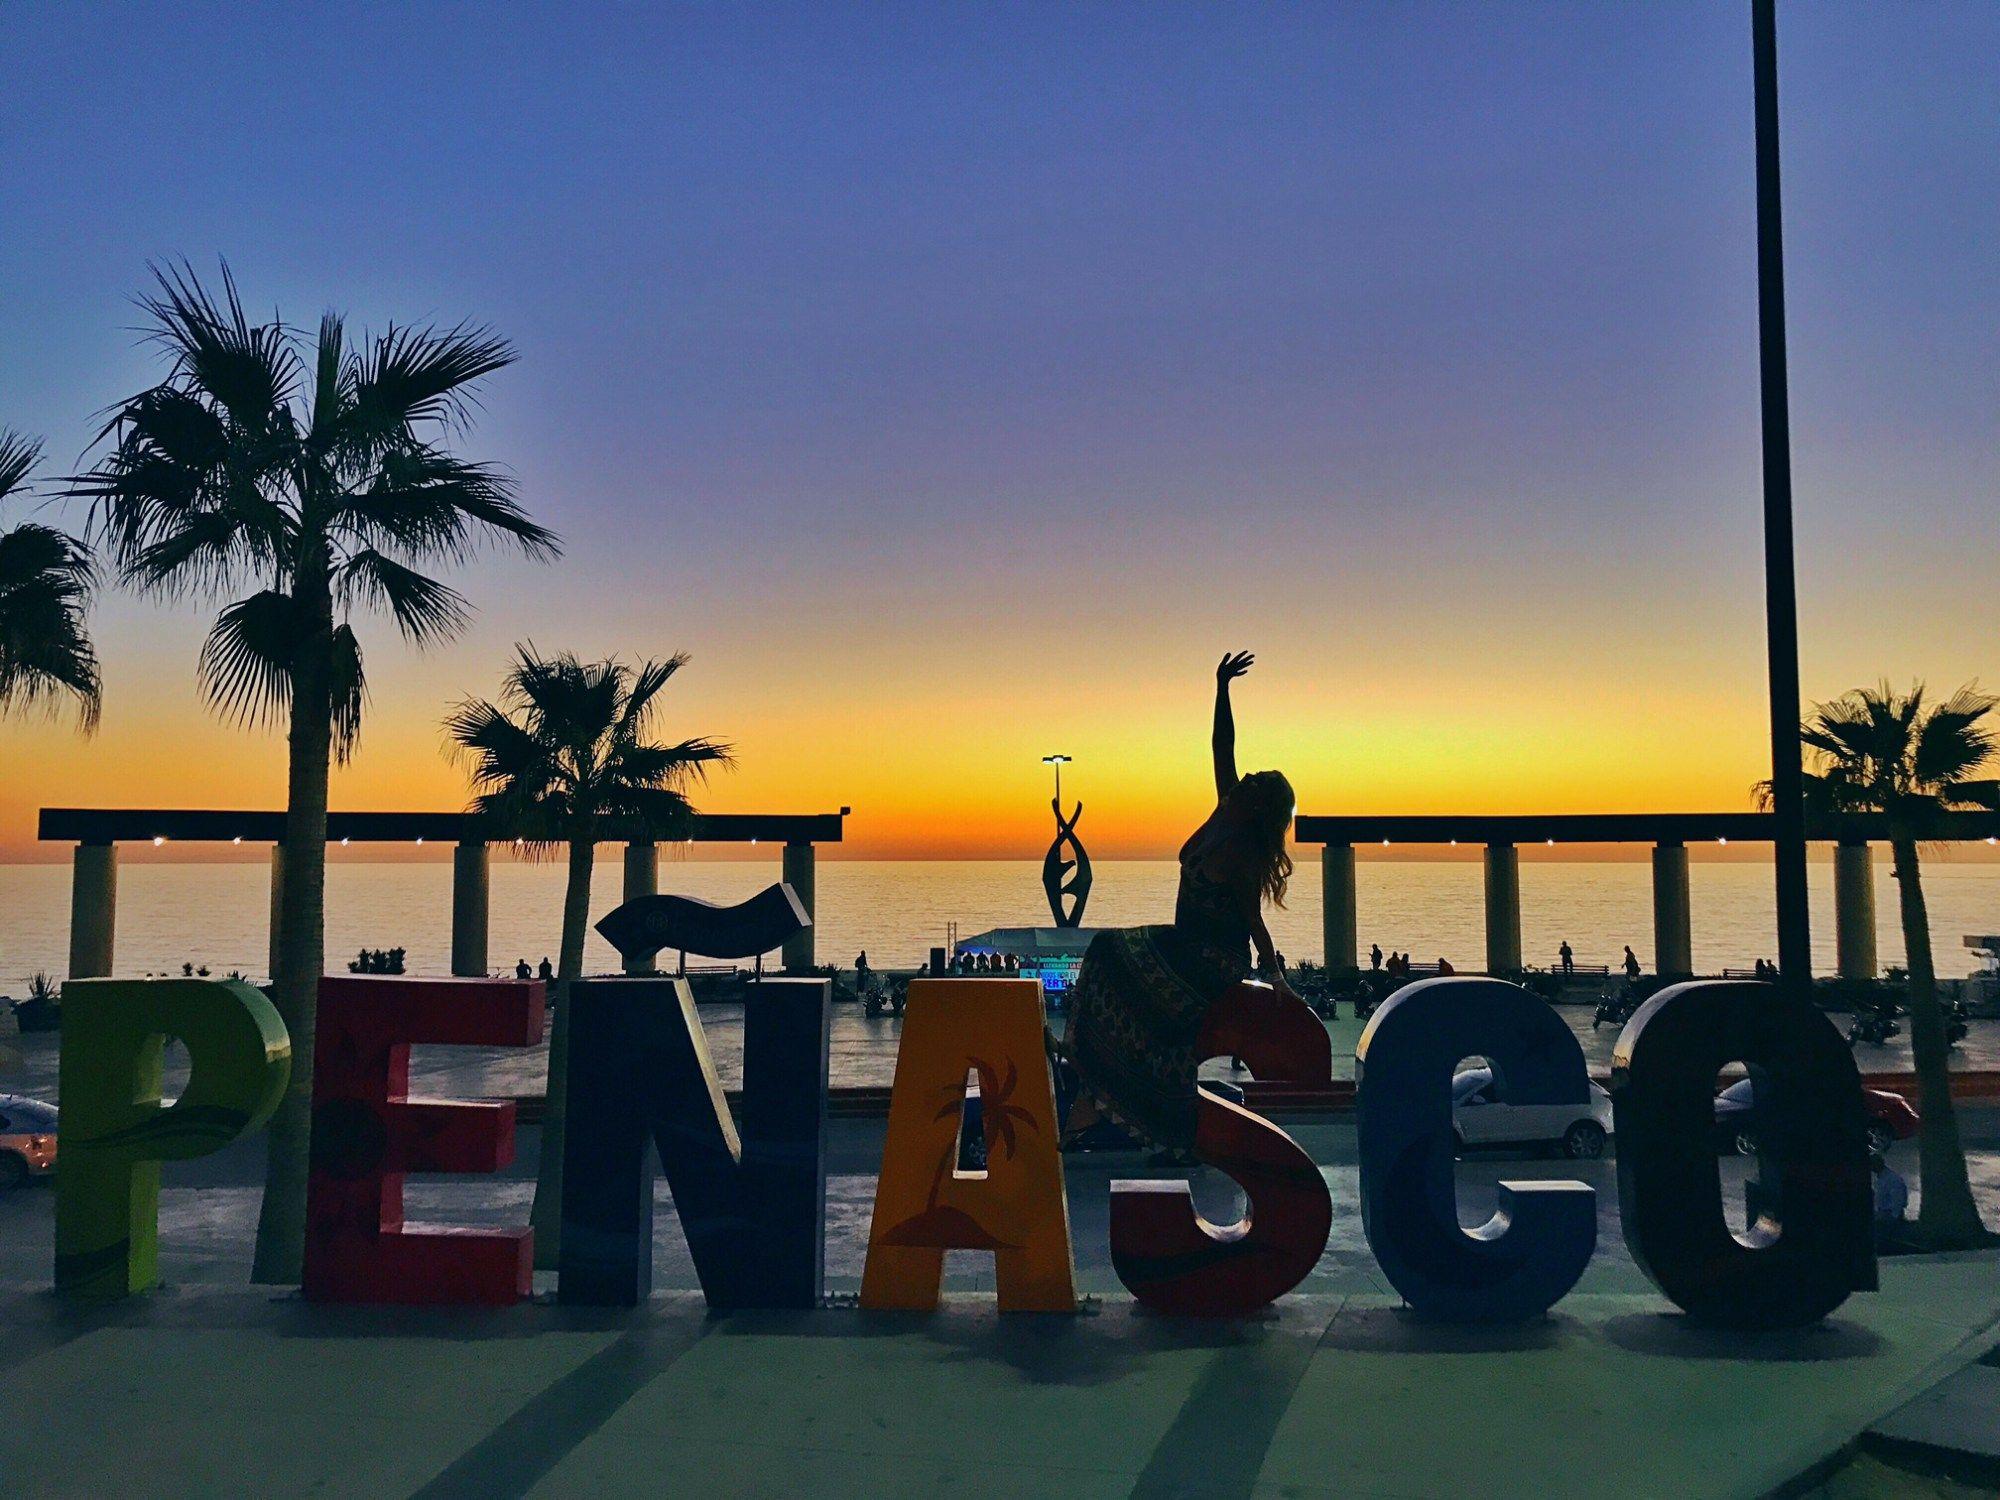 10 Things to do in Puerto Peñasco | Viajes, Malecon